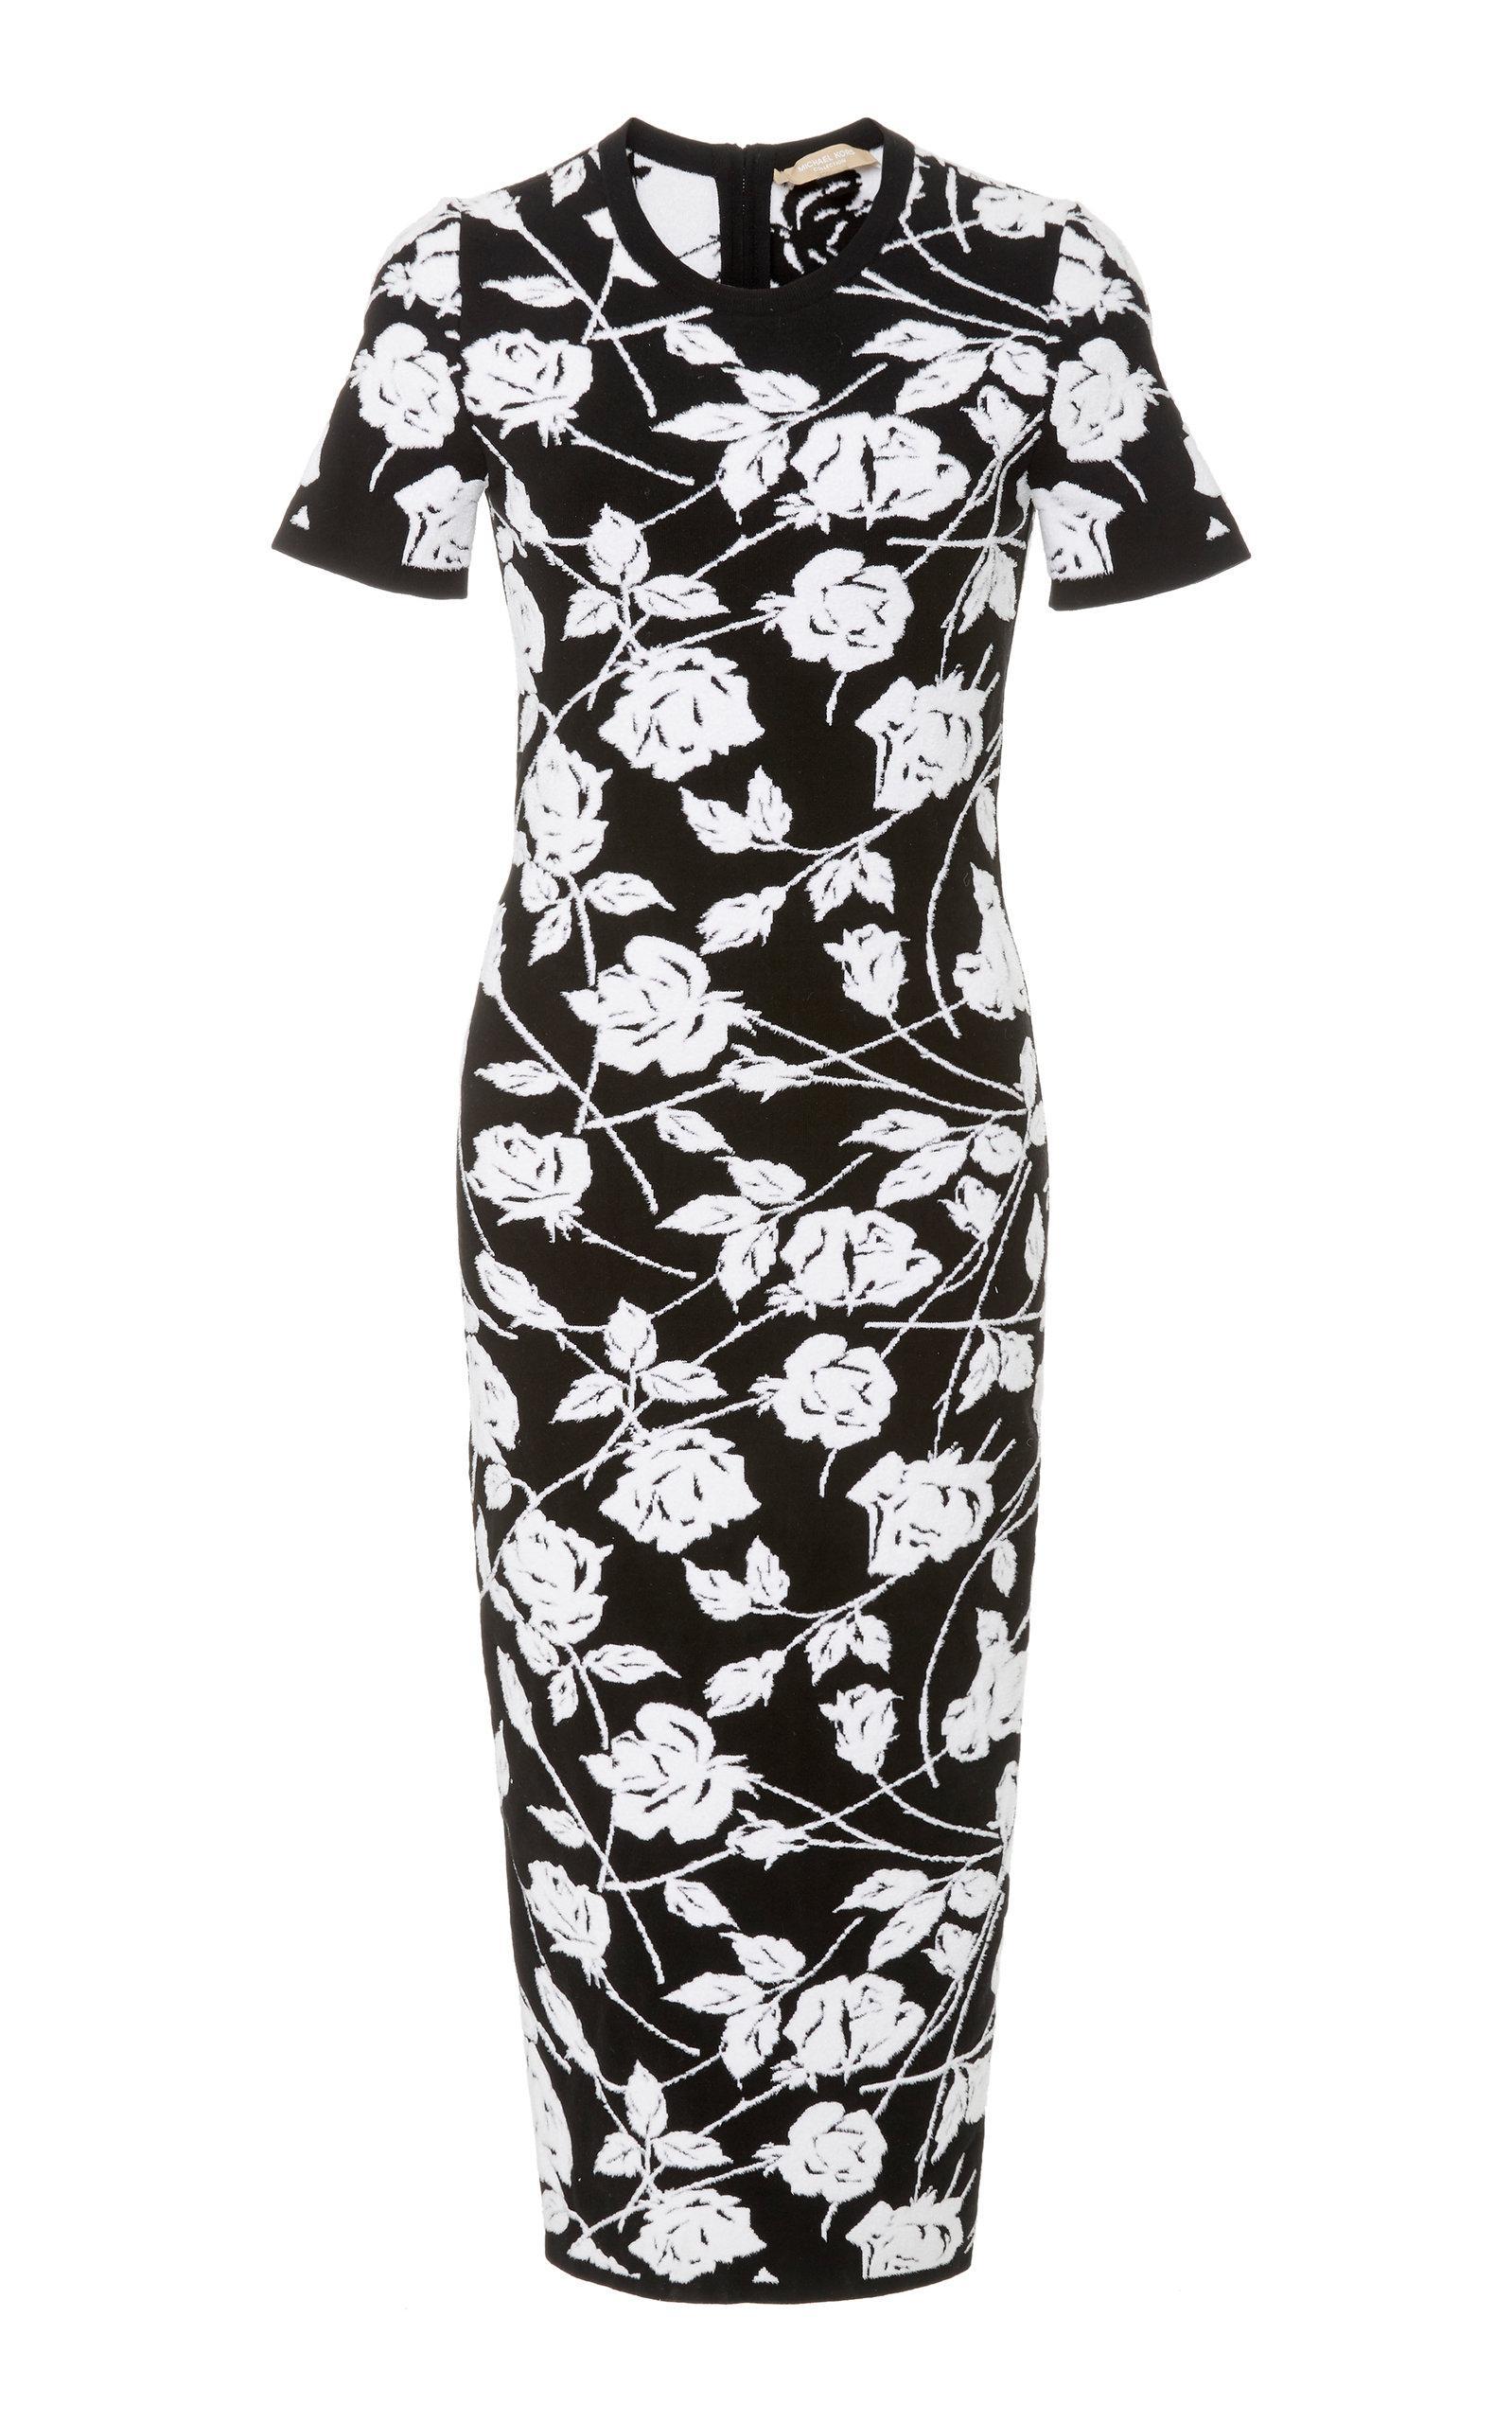 09f384328d Michael Kors Stencil Rose Jacquard Sheath Dress In Black White ...